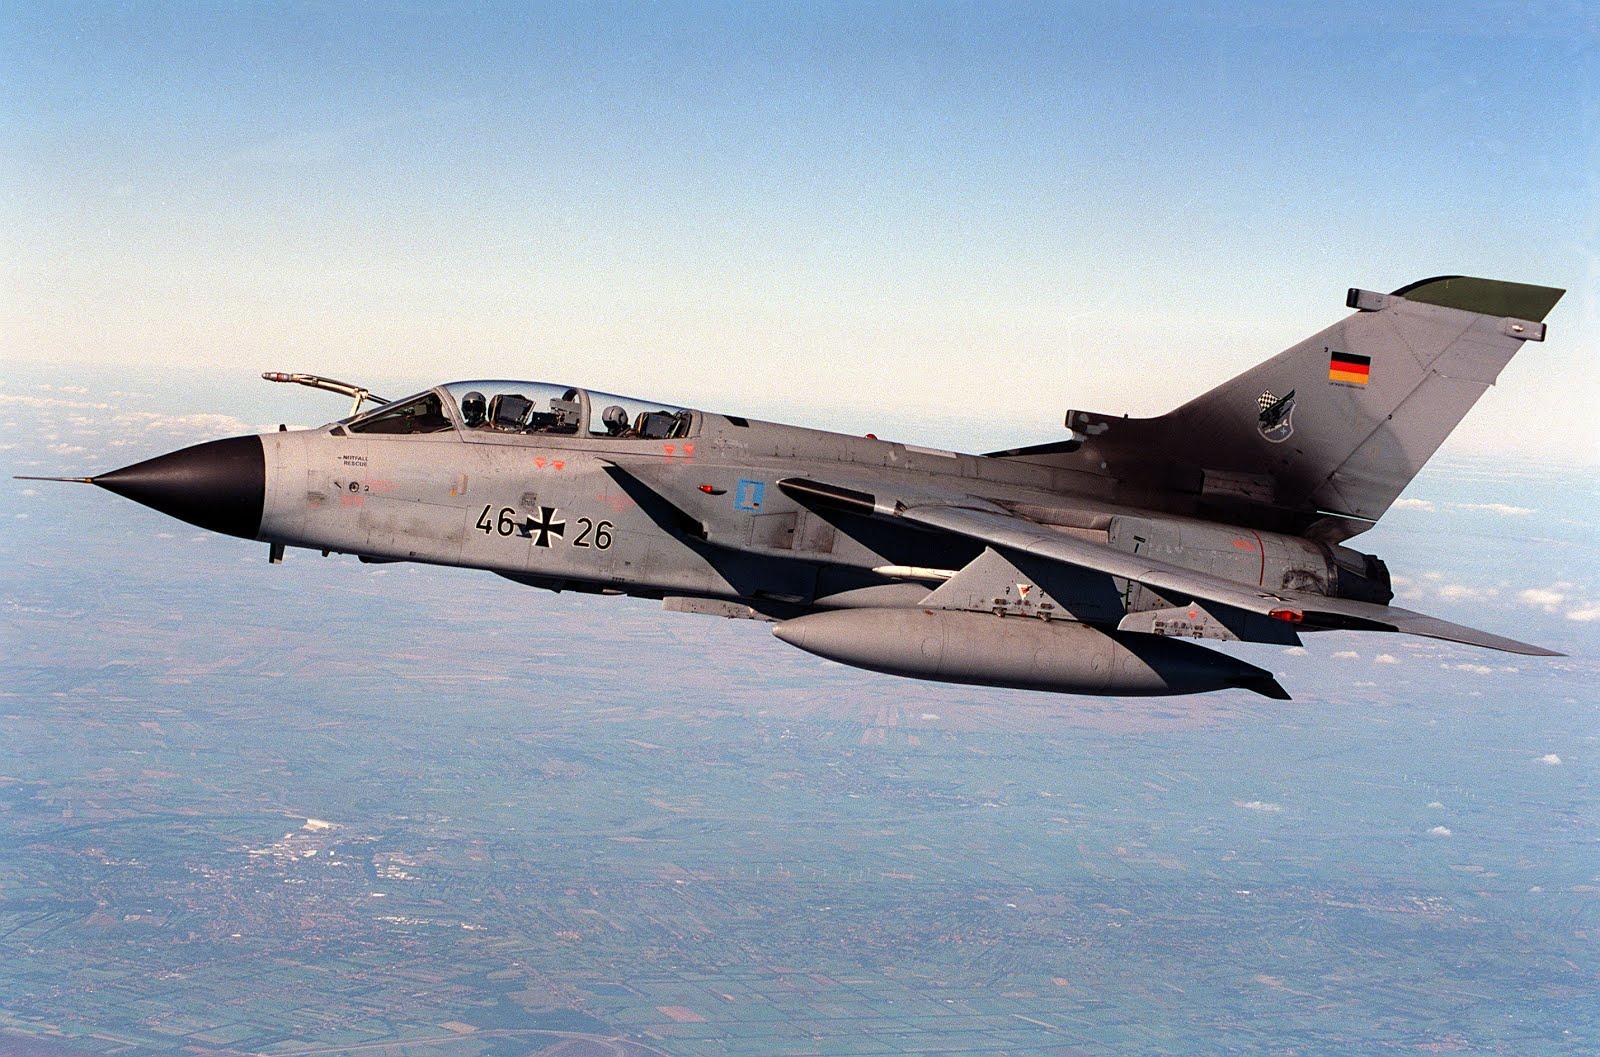 German Panavia Tornado ECR Wild Wease